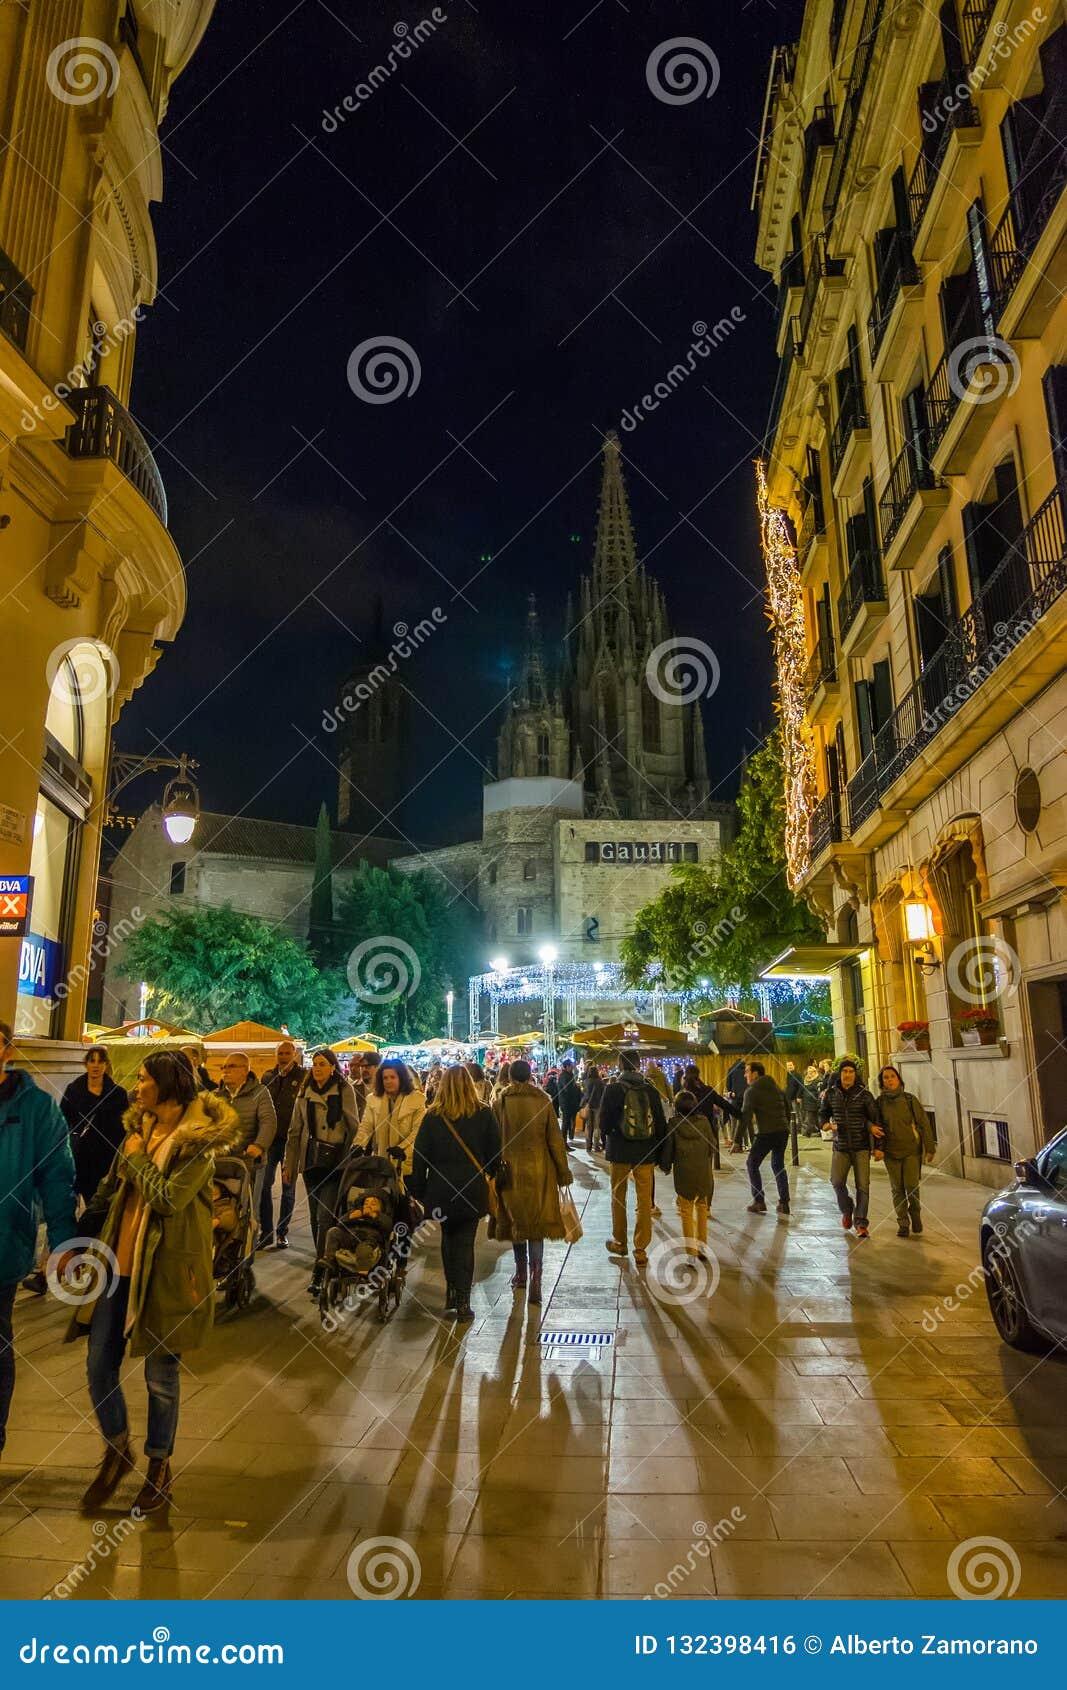 Santa Llucia christmas market at night in Barcelona, Catalonia, Spain